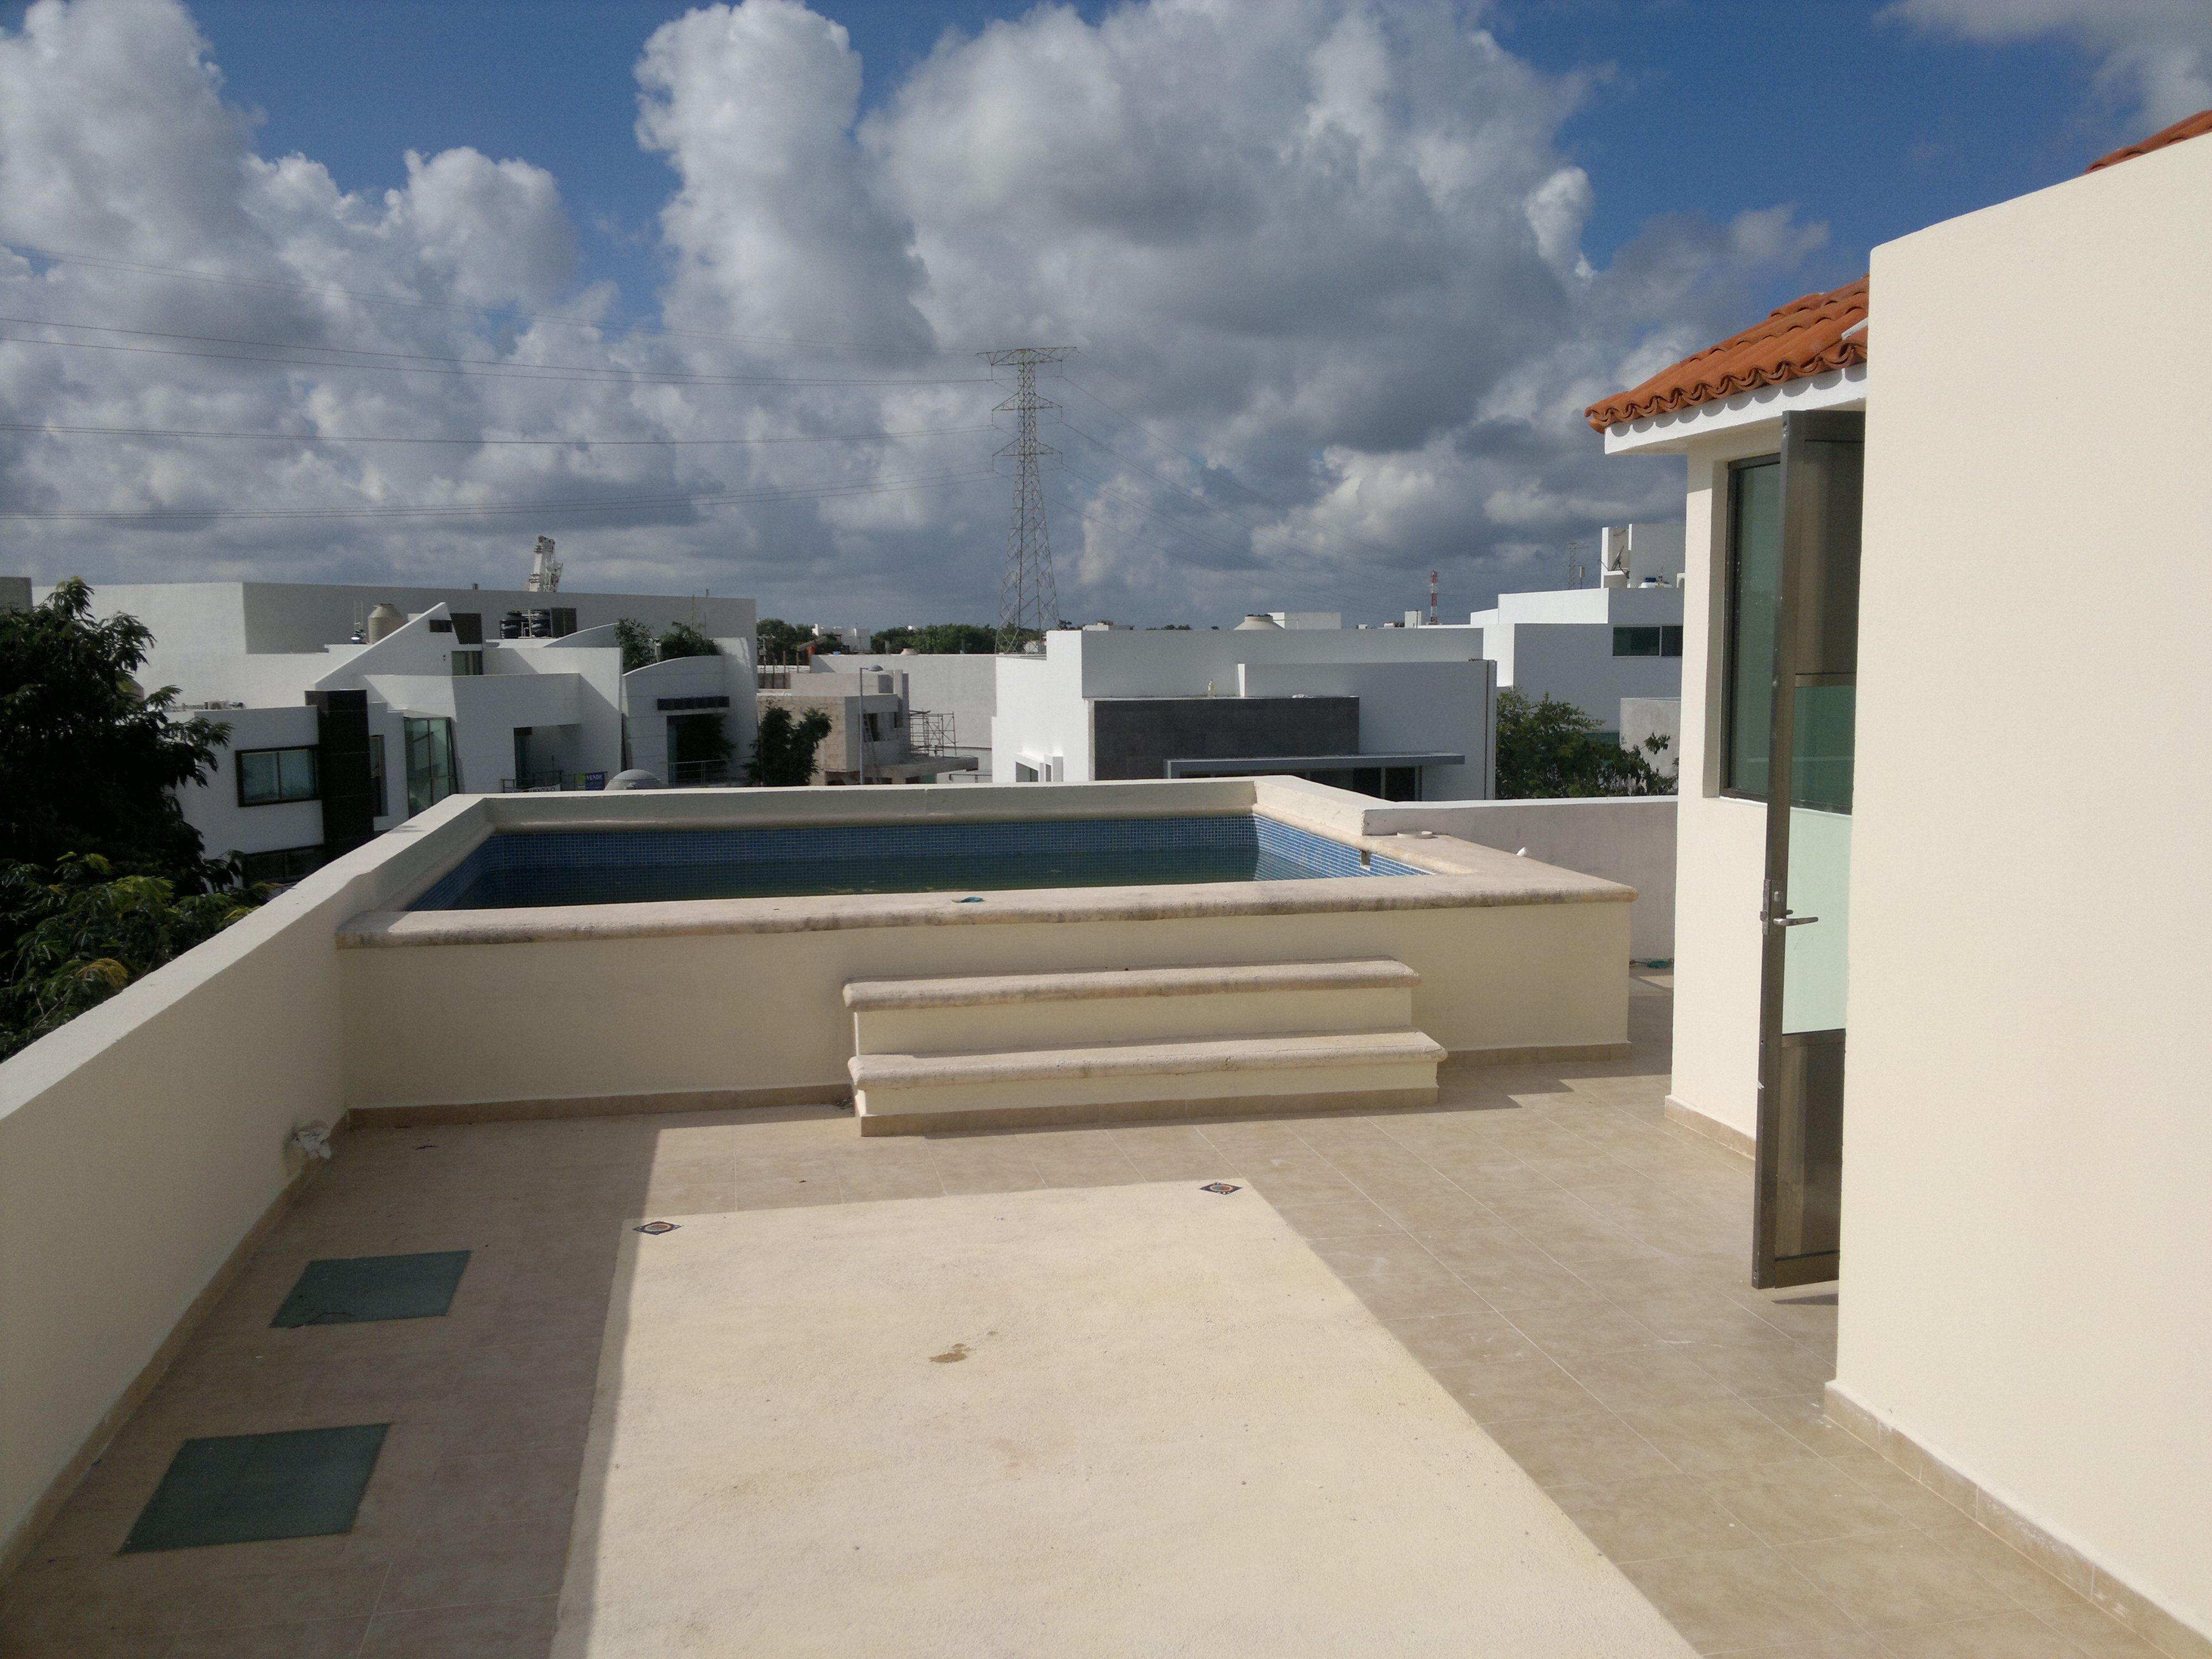 Casa en venta en residencial palmaris descripci n for Construir alberca en azotea